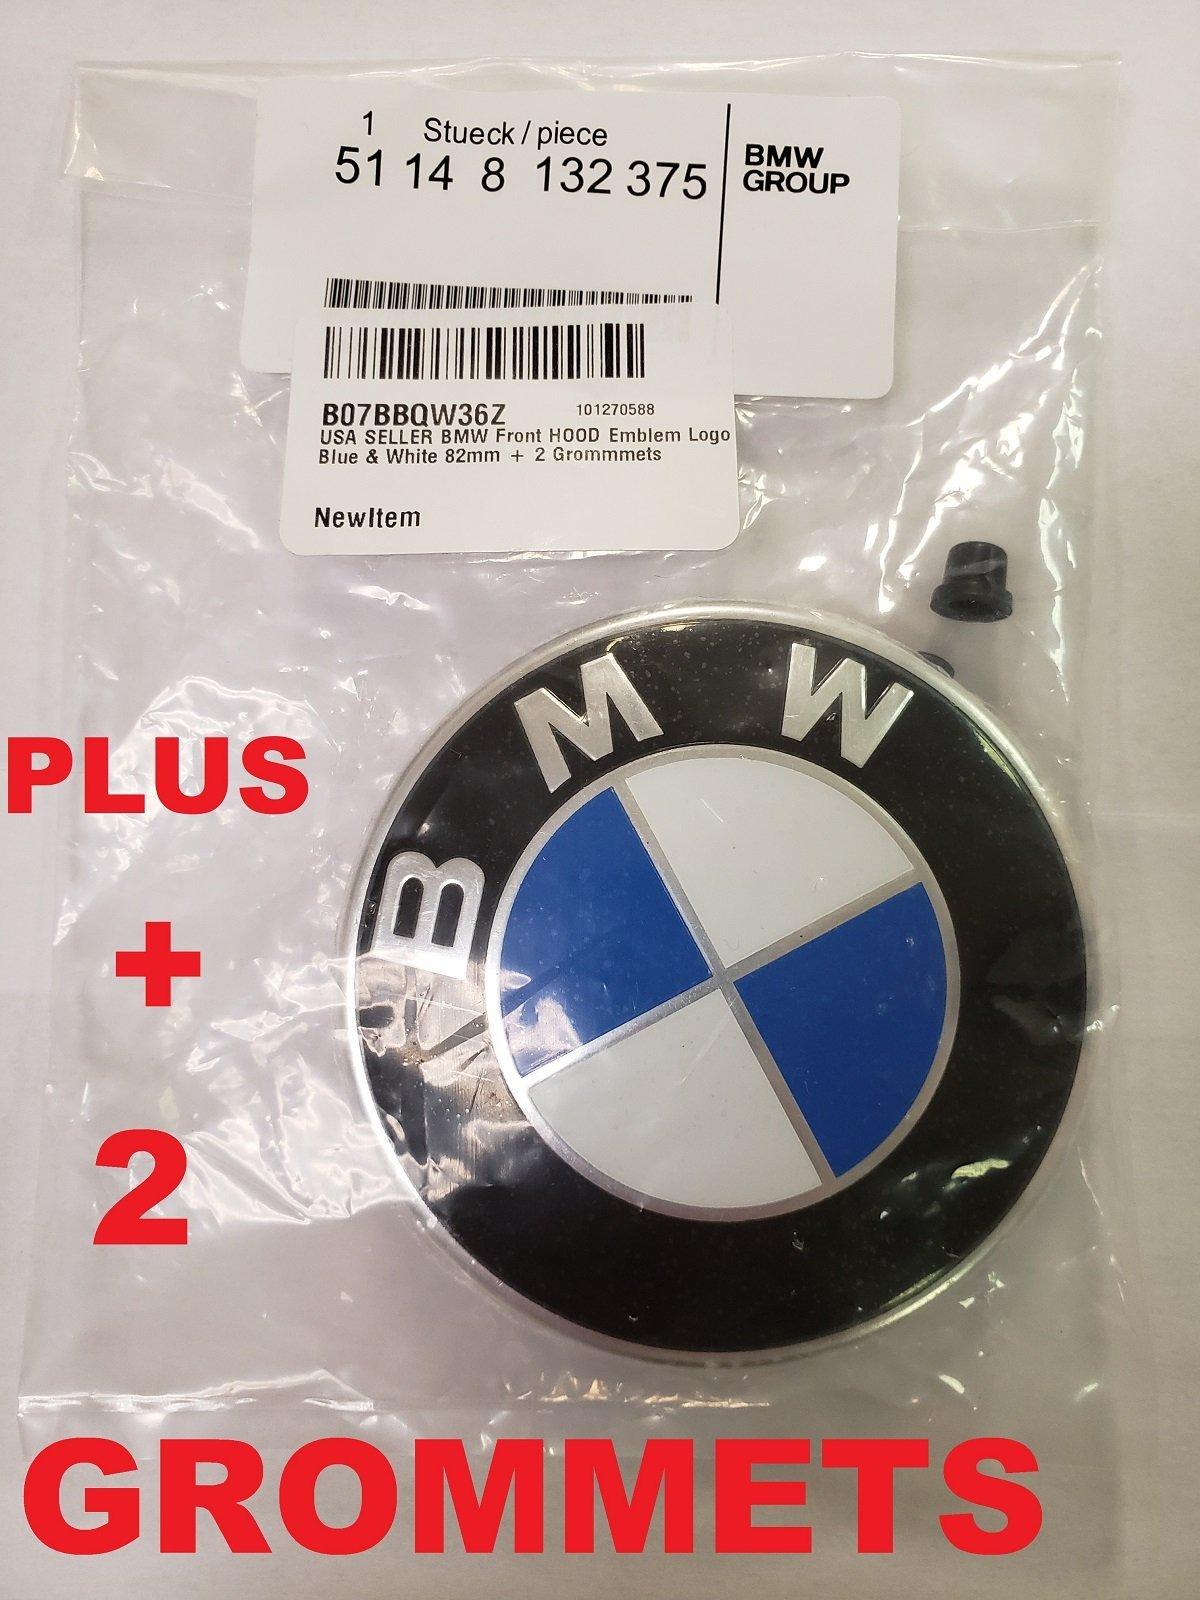 BMW Hood roundel emblem logo replacement hood 82mm + 2 Grommets for ALL Models BMW E30 E36 E46 E34 E39 E60 E65 E38 X3 X5 X6 3 4 5 6 7 8